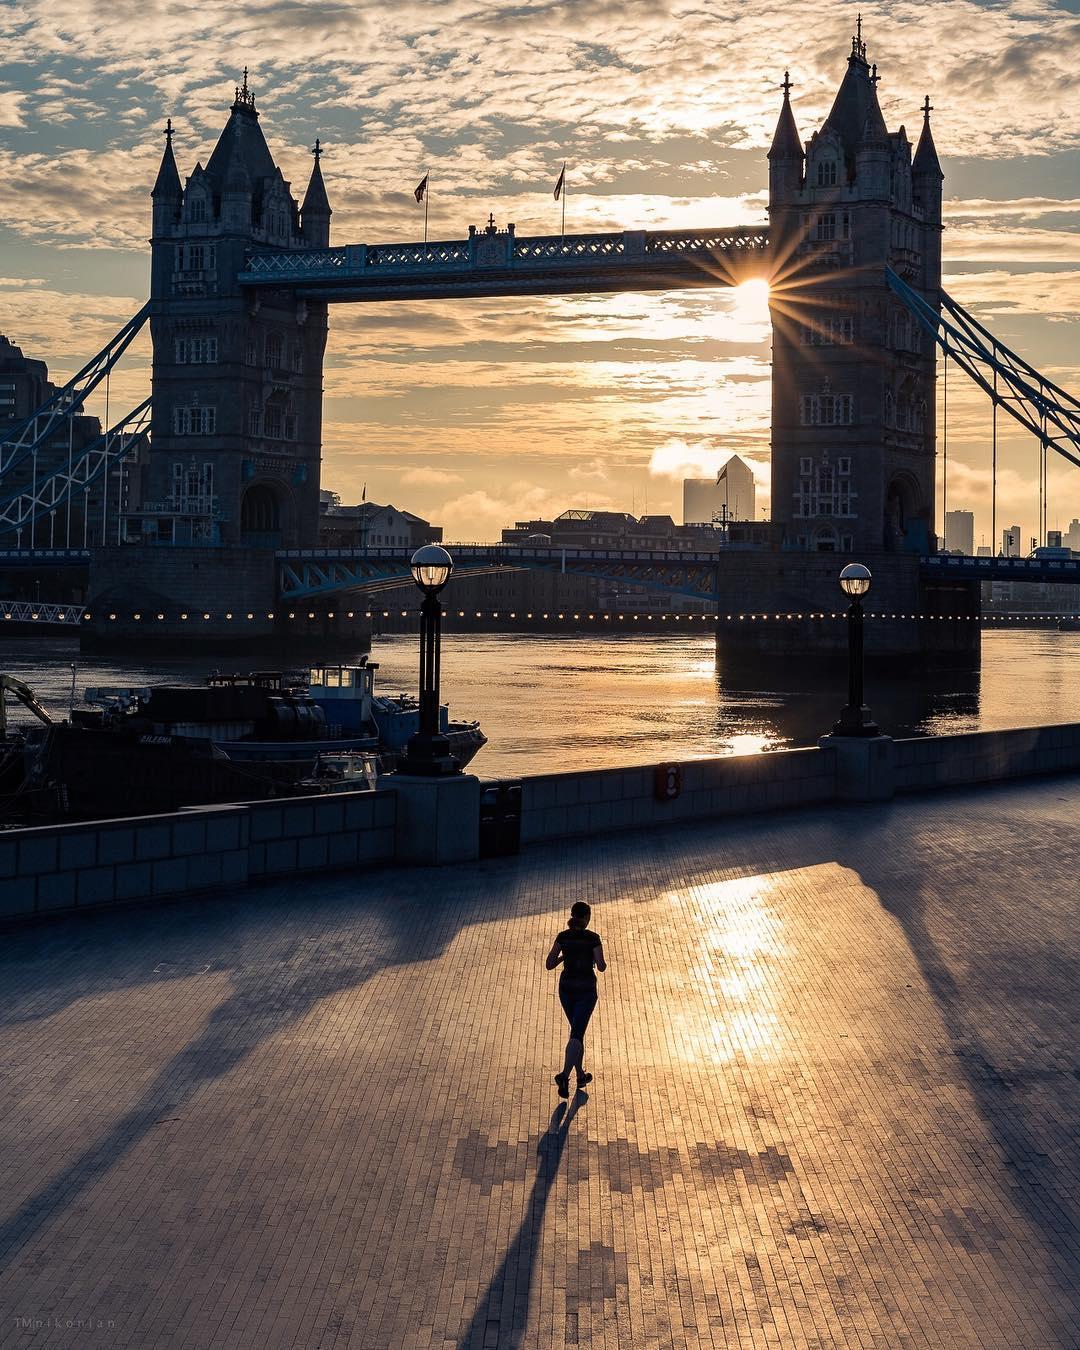 Tower Bridge sunset photo London.